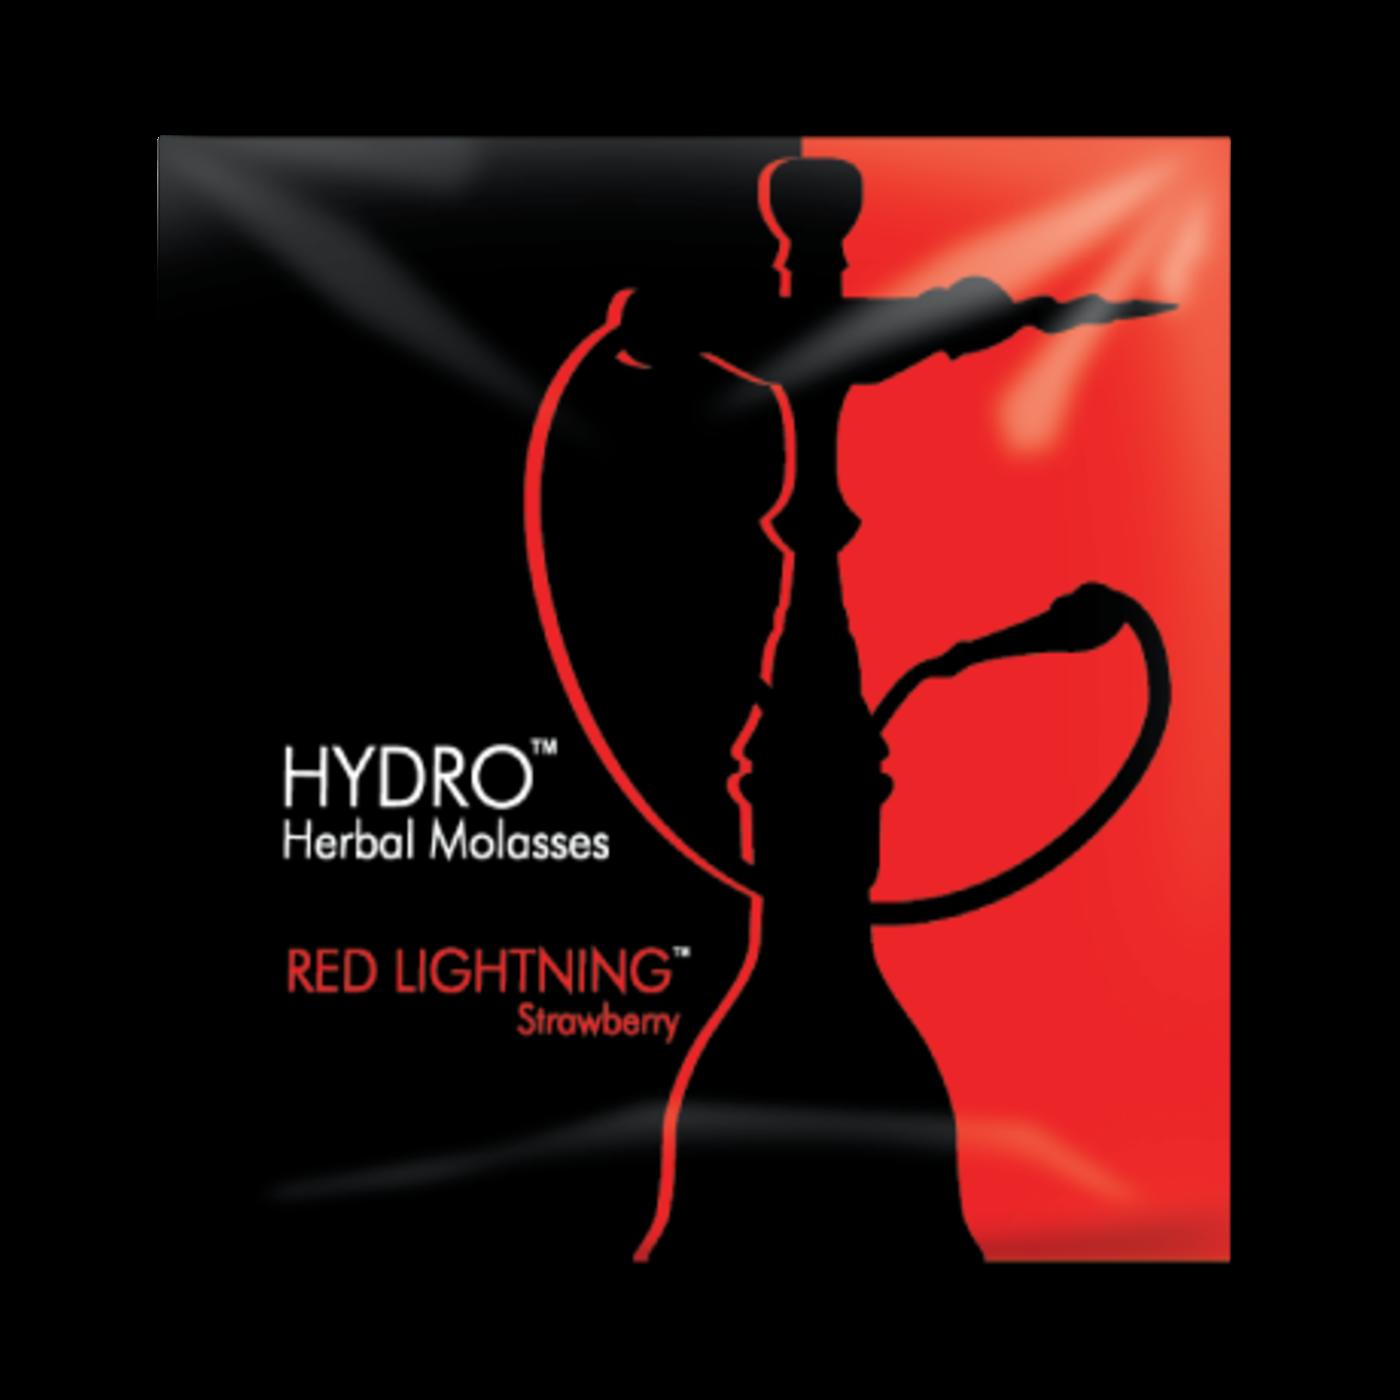 1400x1400 Hydro Herbal Shisha Red Lightning Buy Online In Canada